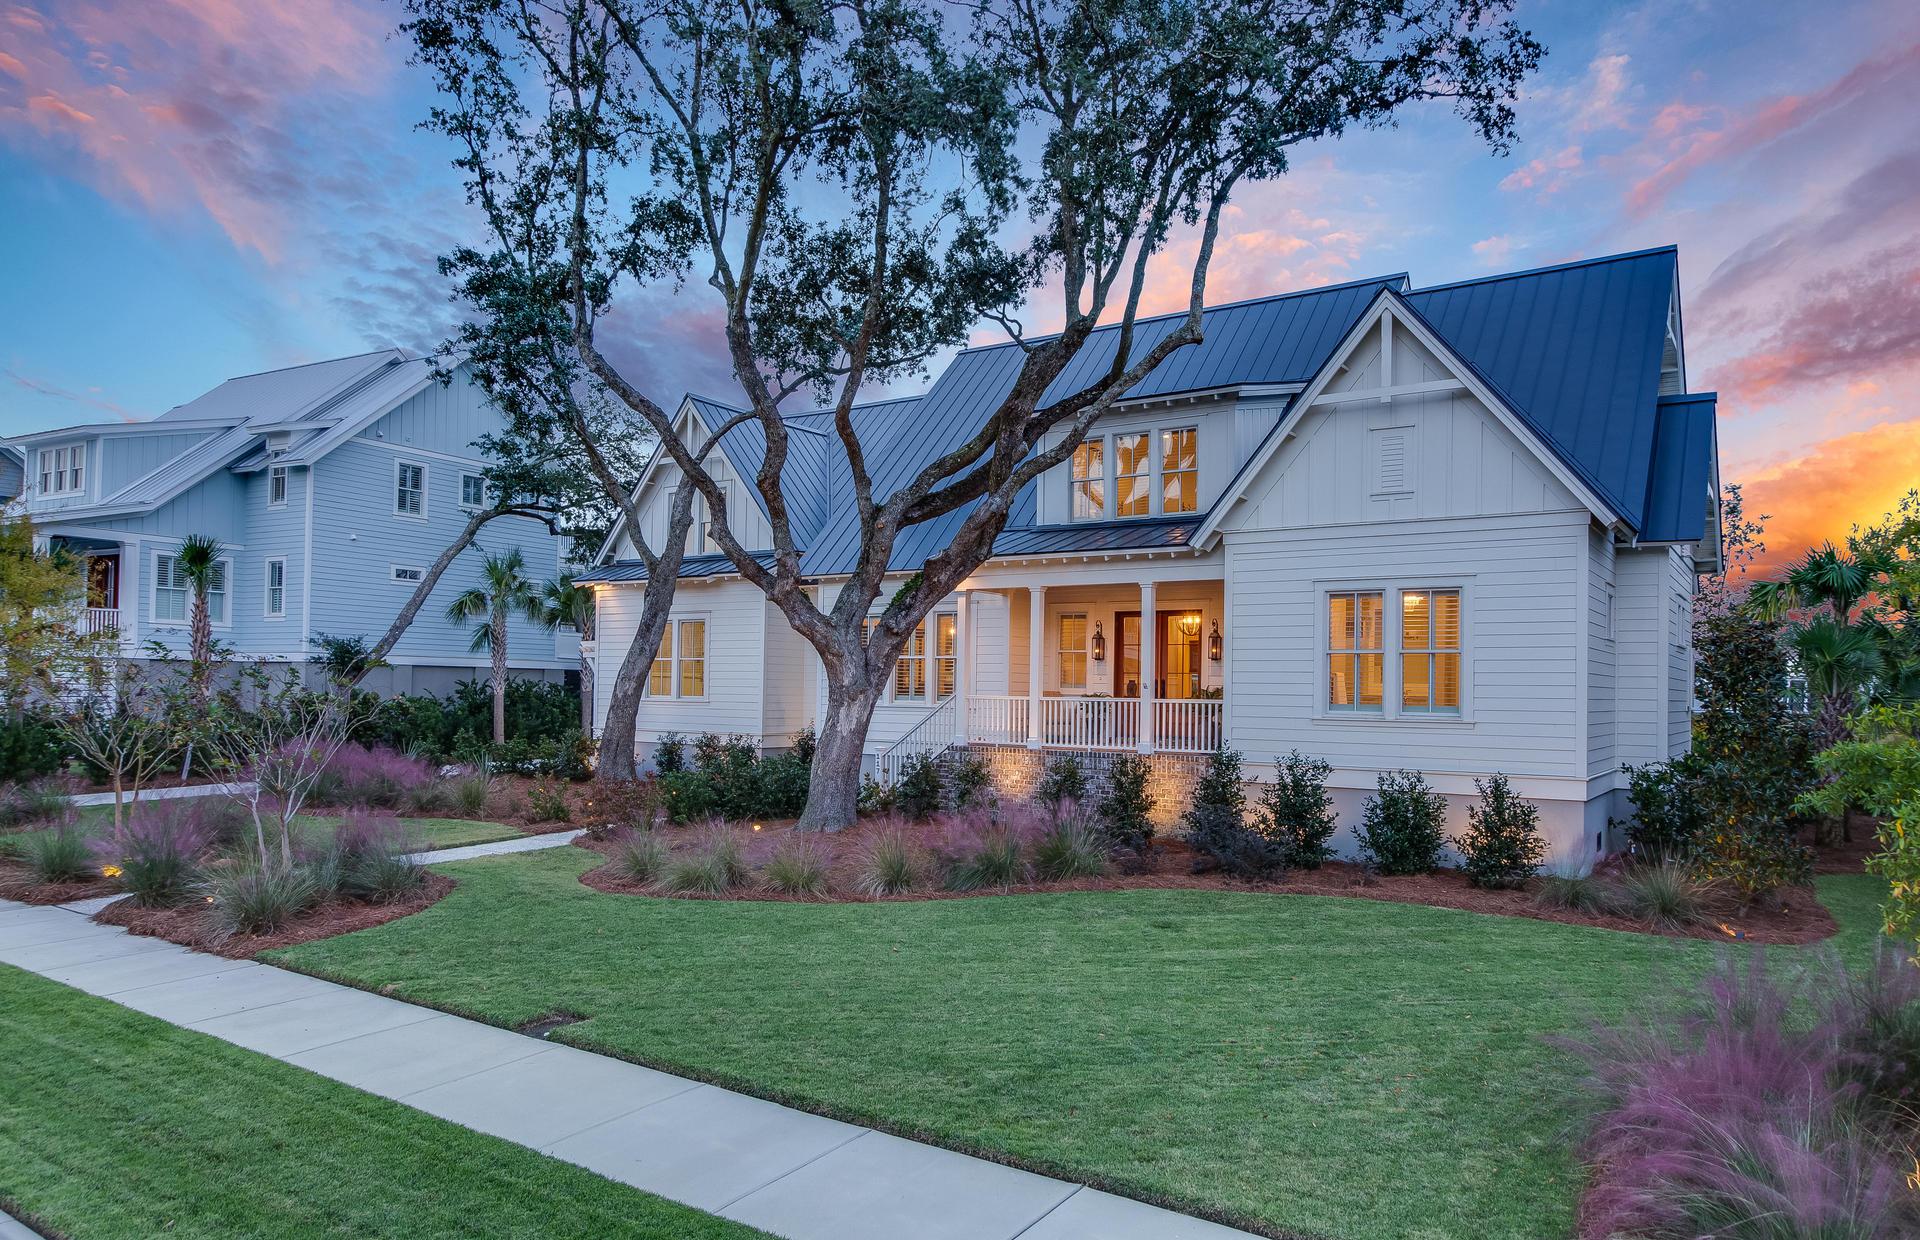 Daniel Island Park Homes For Sale - 117 Brailsford, Charleston, SC - 90